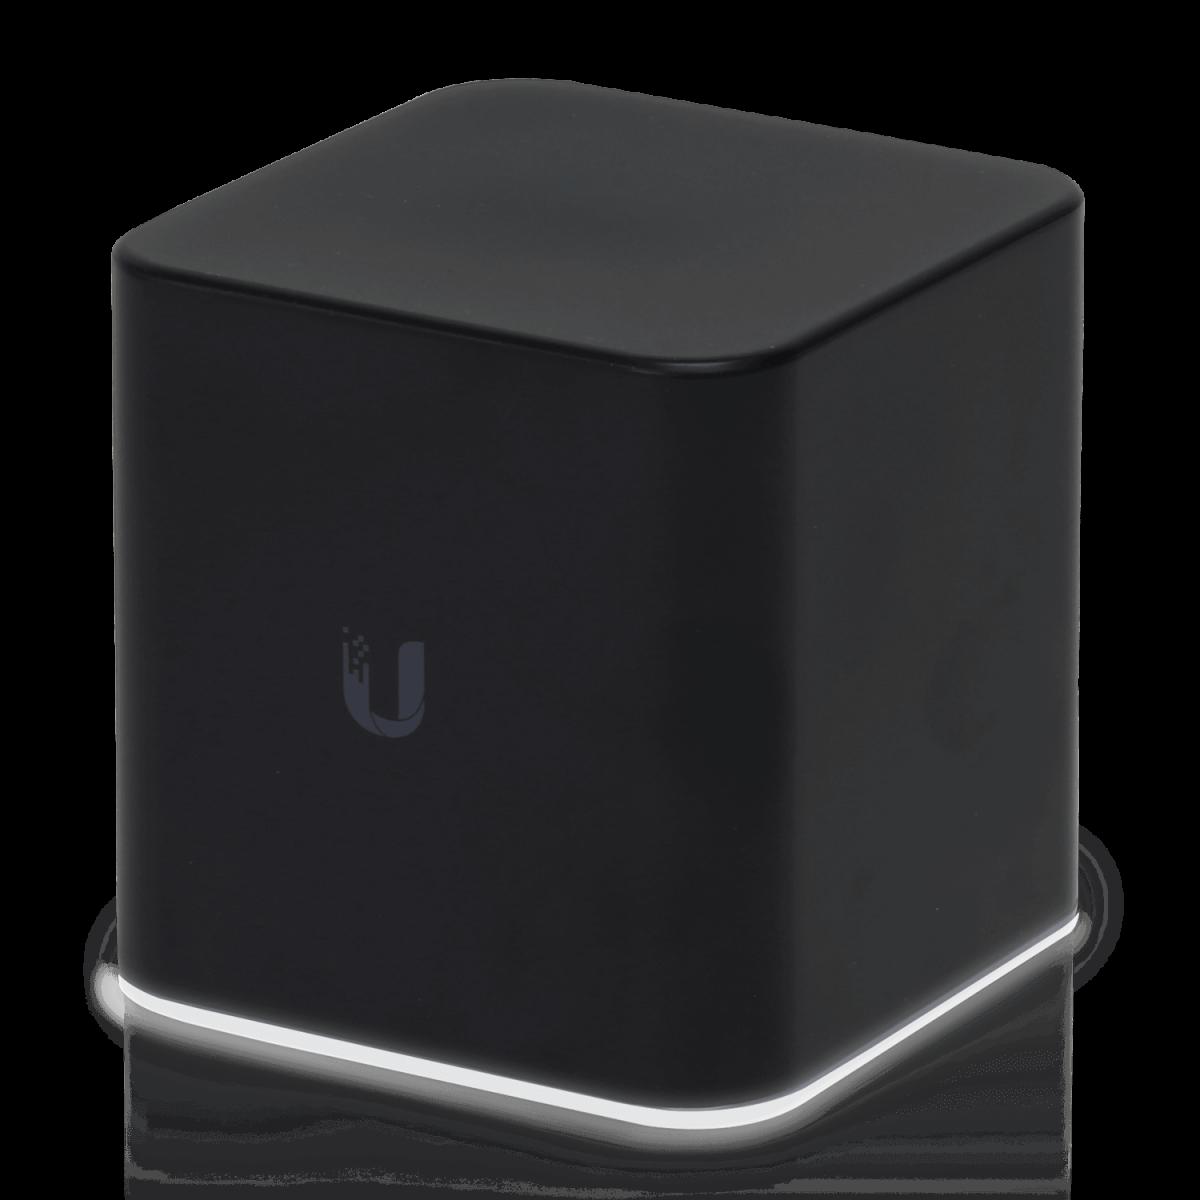 Ubiquiti ACB-AC AirCube Access Point + Gigabit POE Injector Bundle